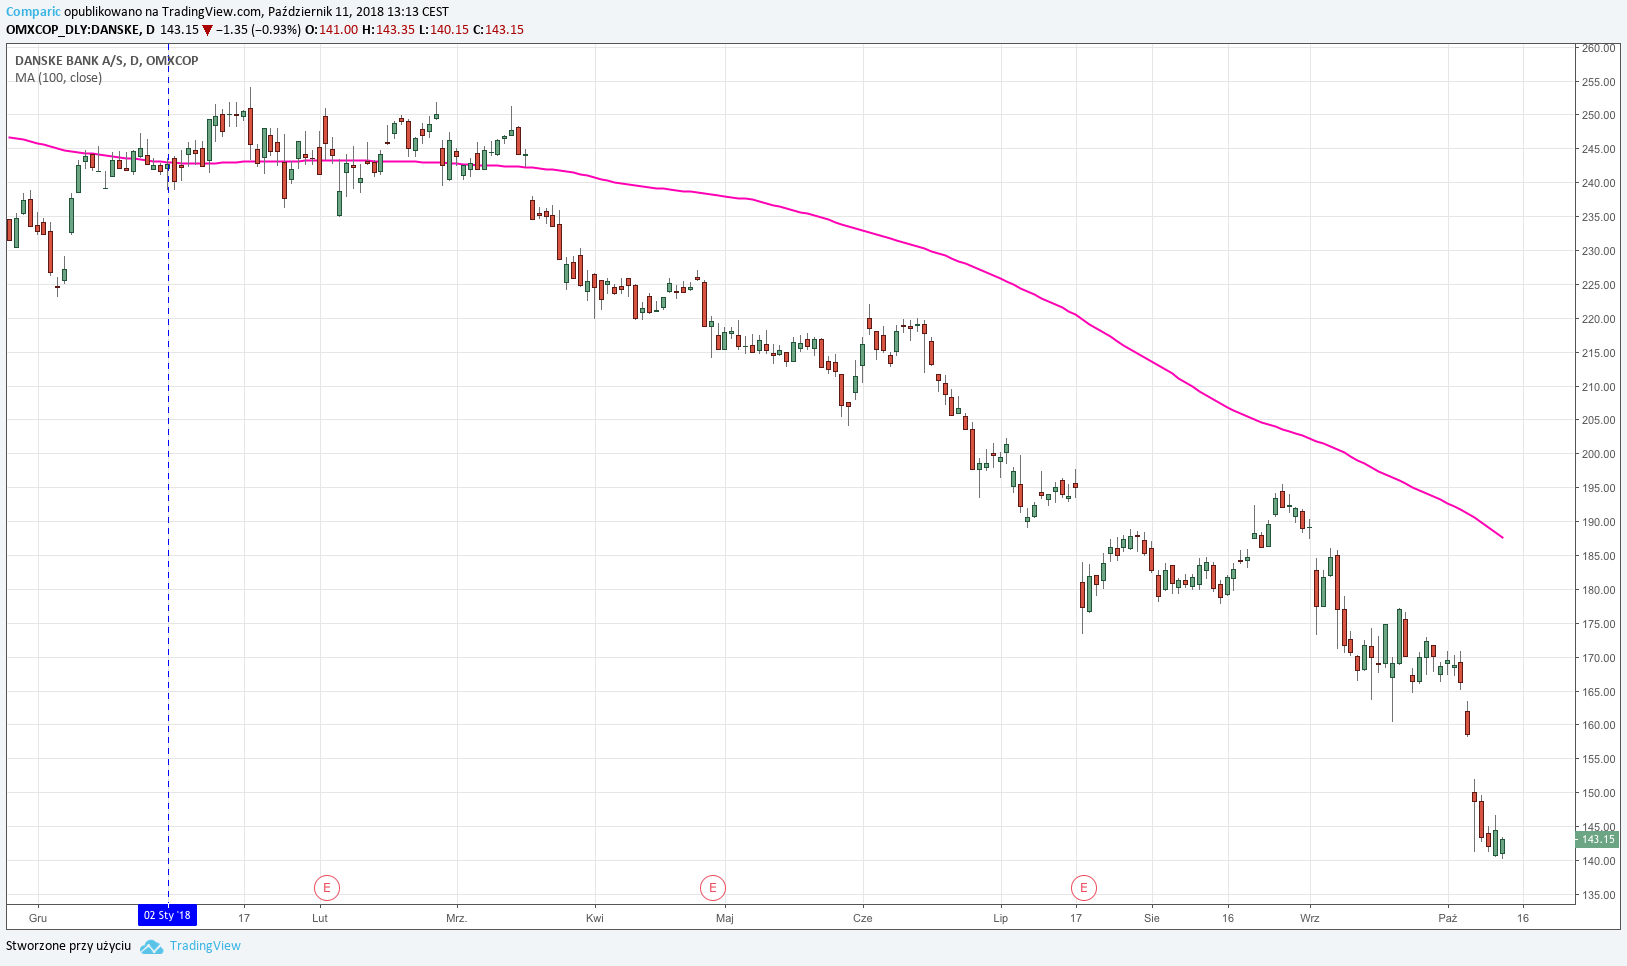 Notowania cen akcji Danske Banku z dnia 11.10.2018 r.